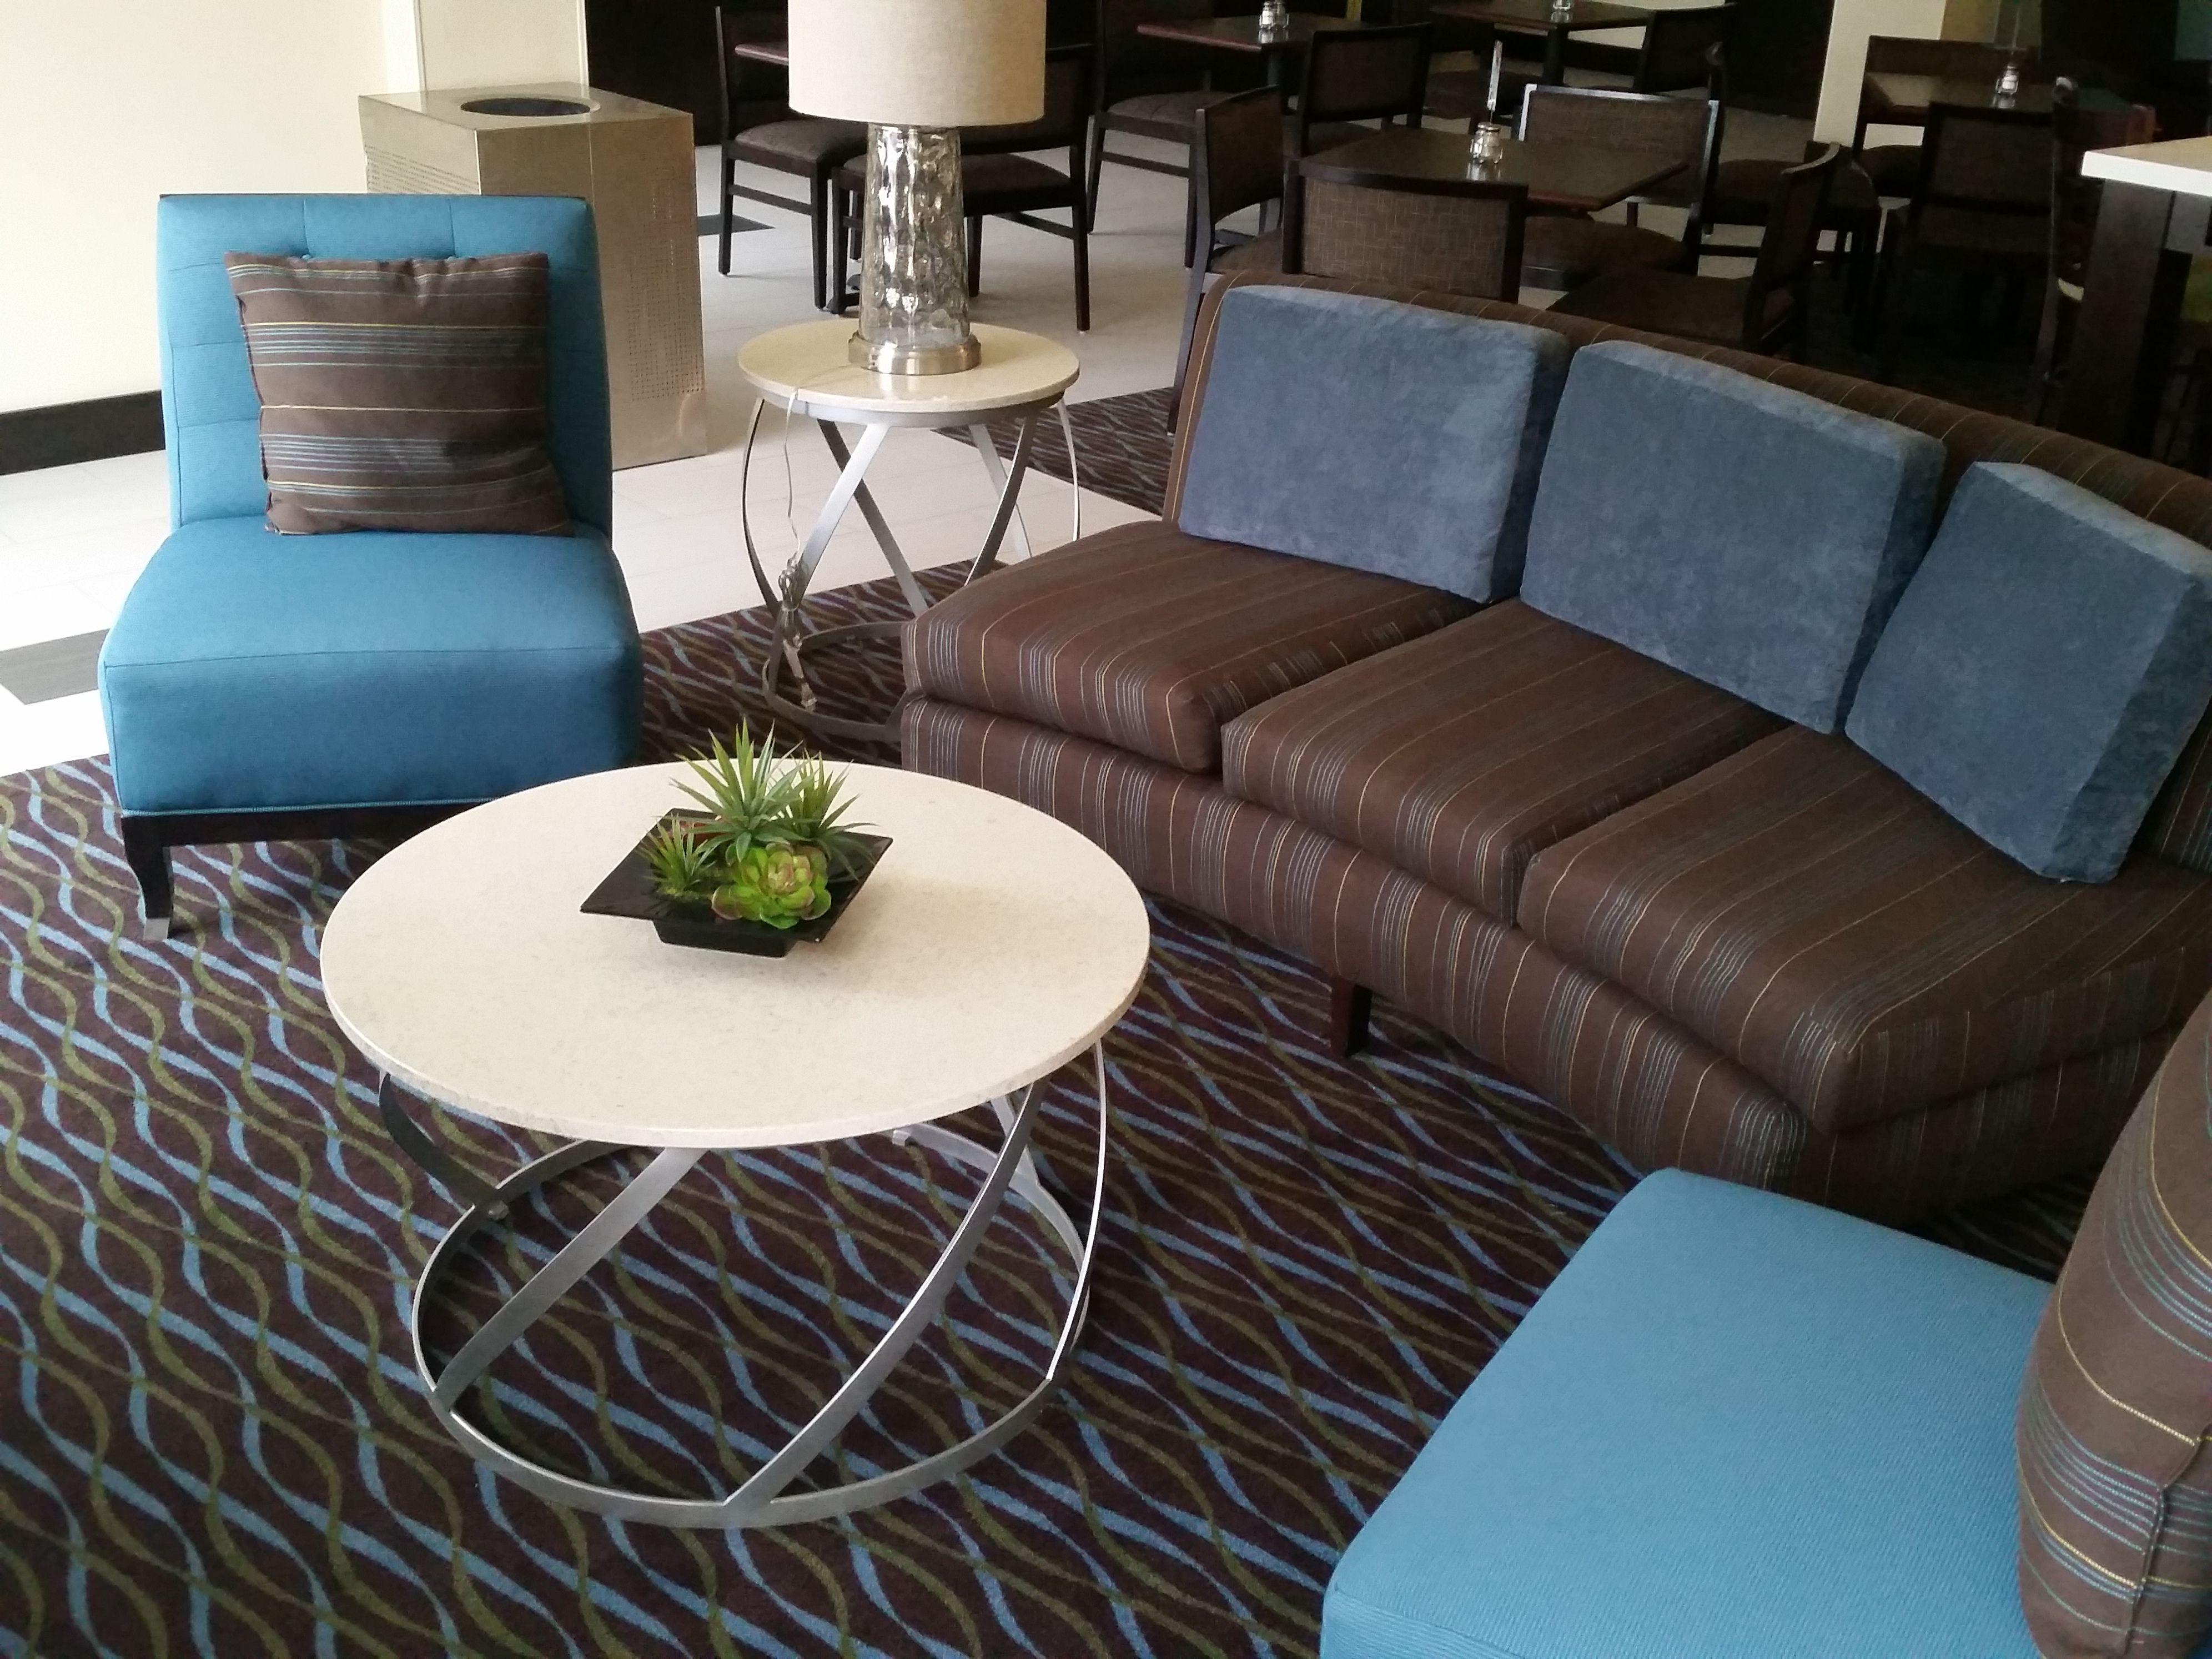 Holiday Inn Express & Suites Atascocita - Humble - Kingwood image 5